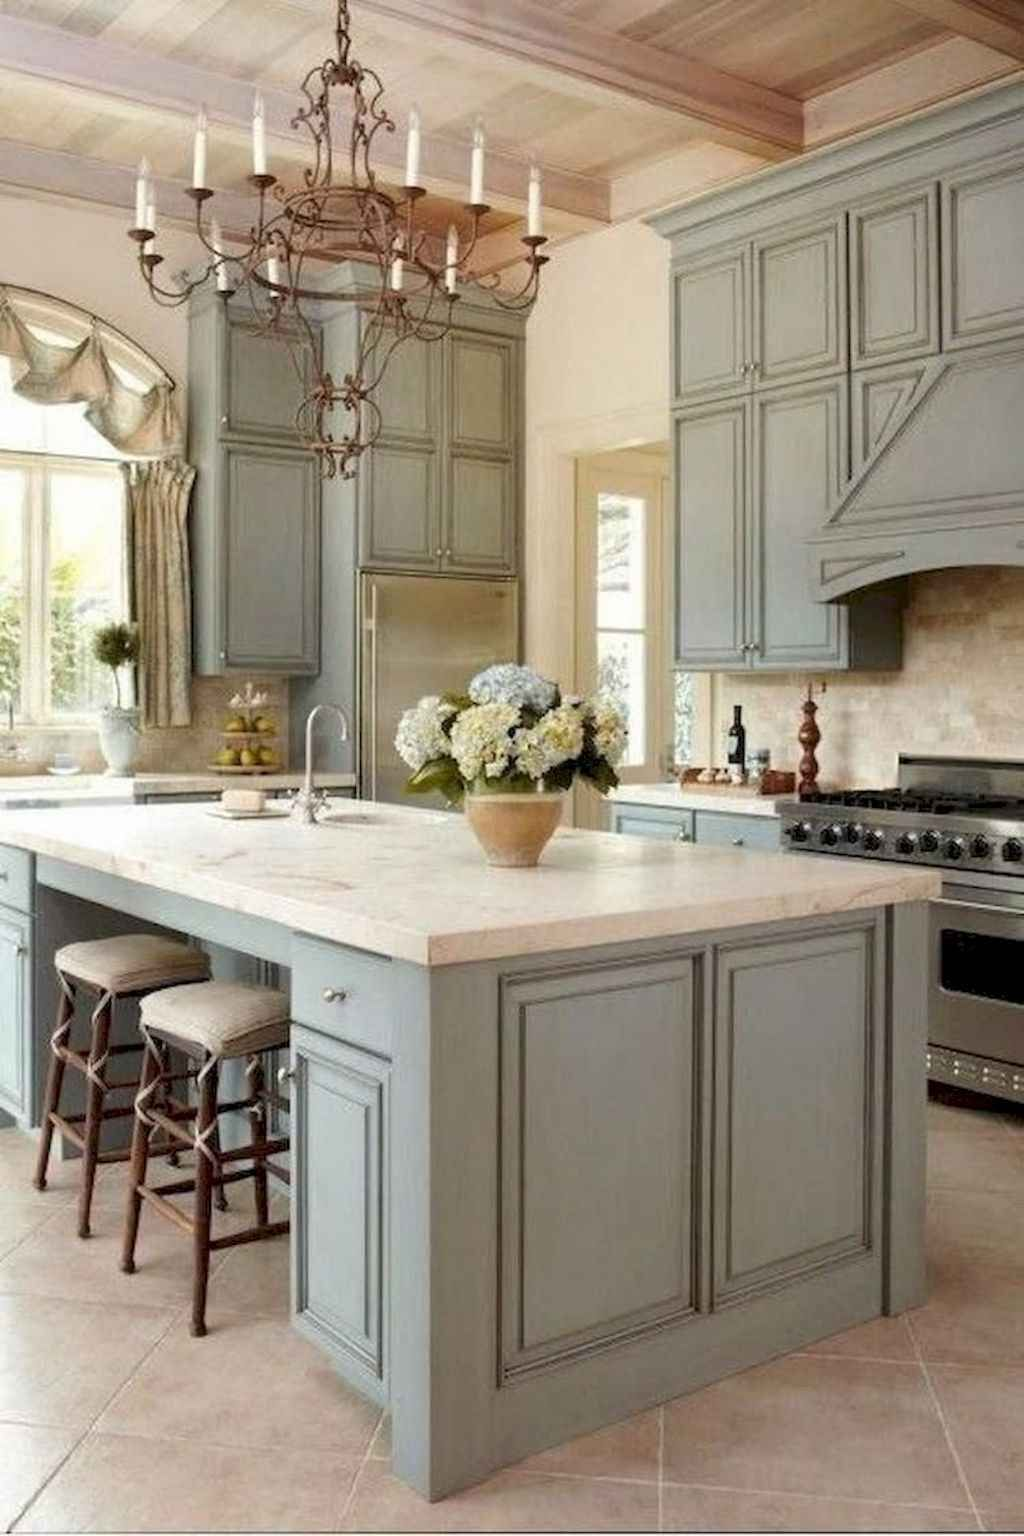 01 Beautiful Farmhouse Kitchen Cabinet Makeover Design Ideas In